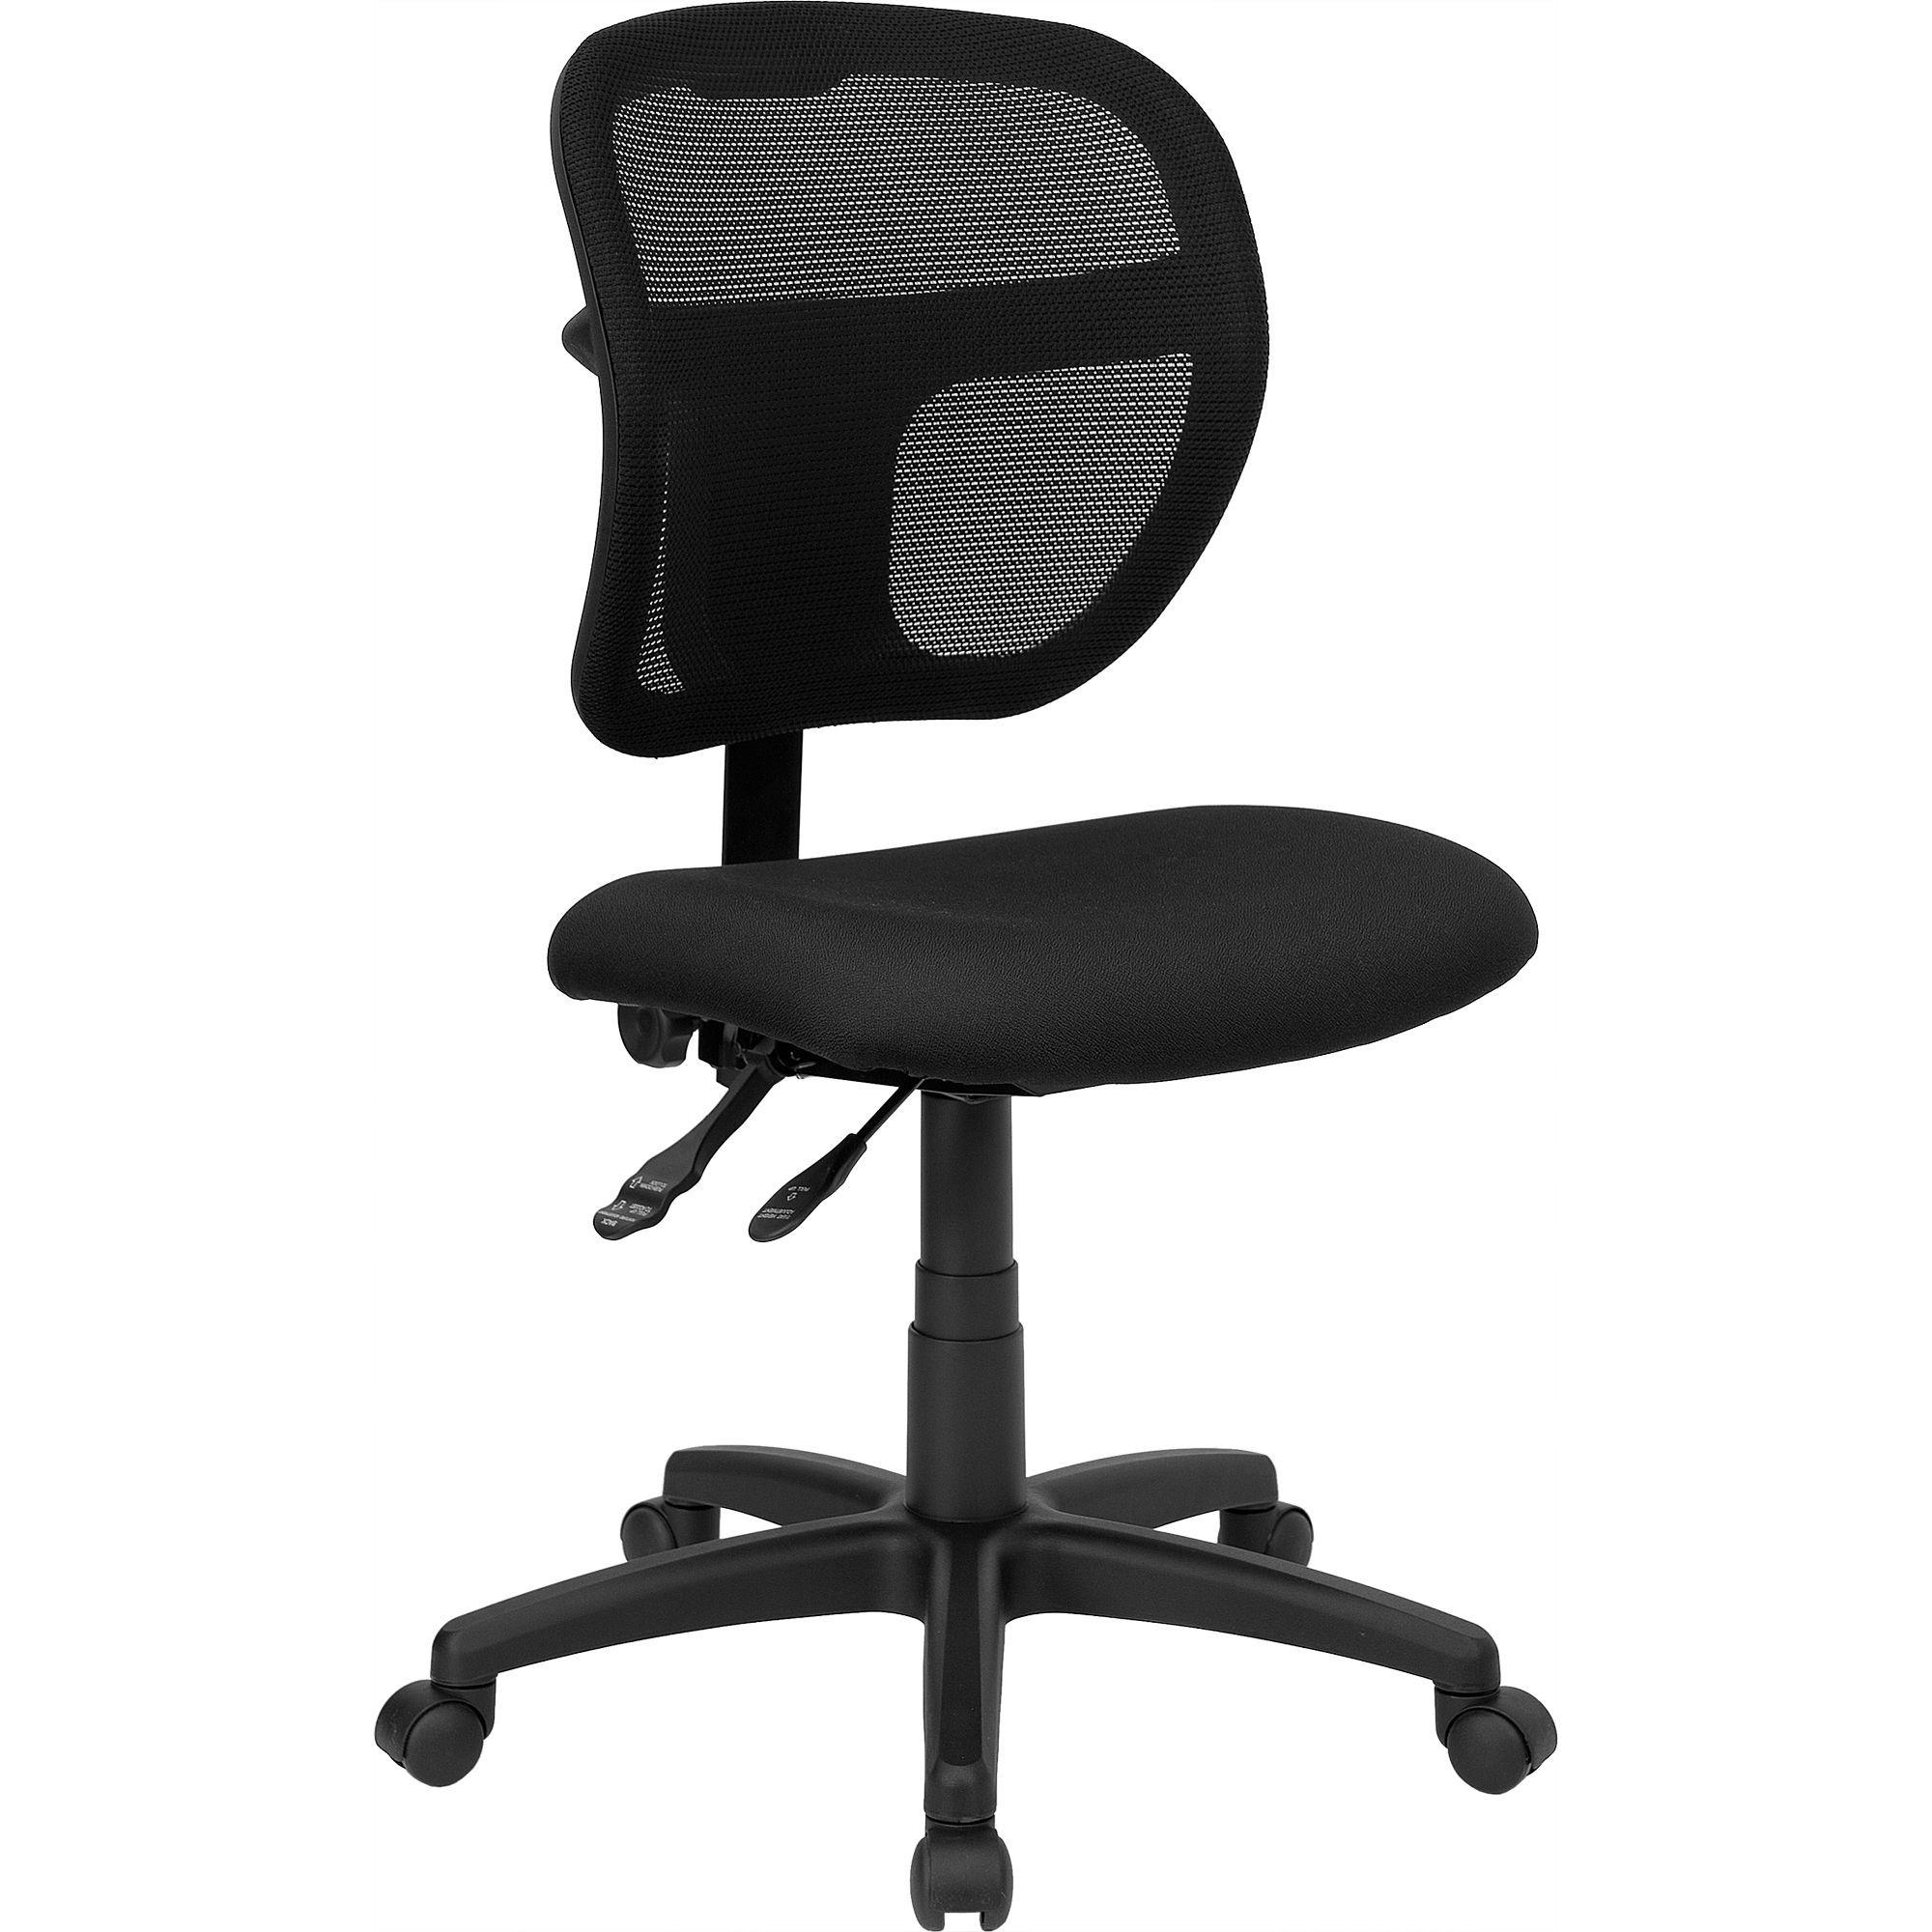 Flash Furniture WL-A7671SYG-BK-GG Black Fabric and Mesh Task Chair